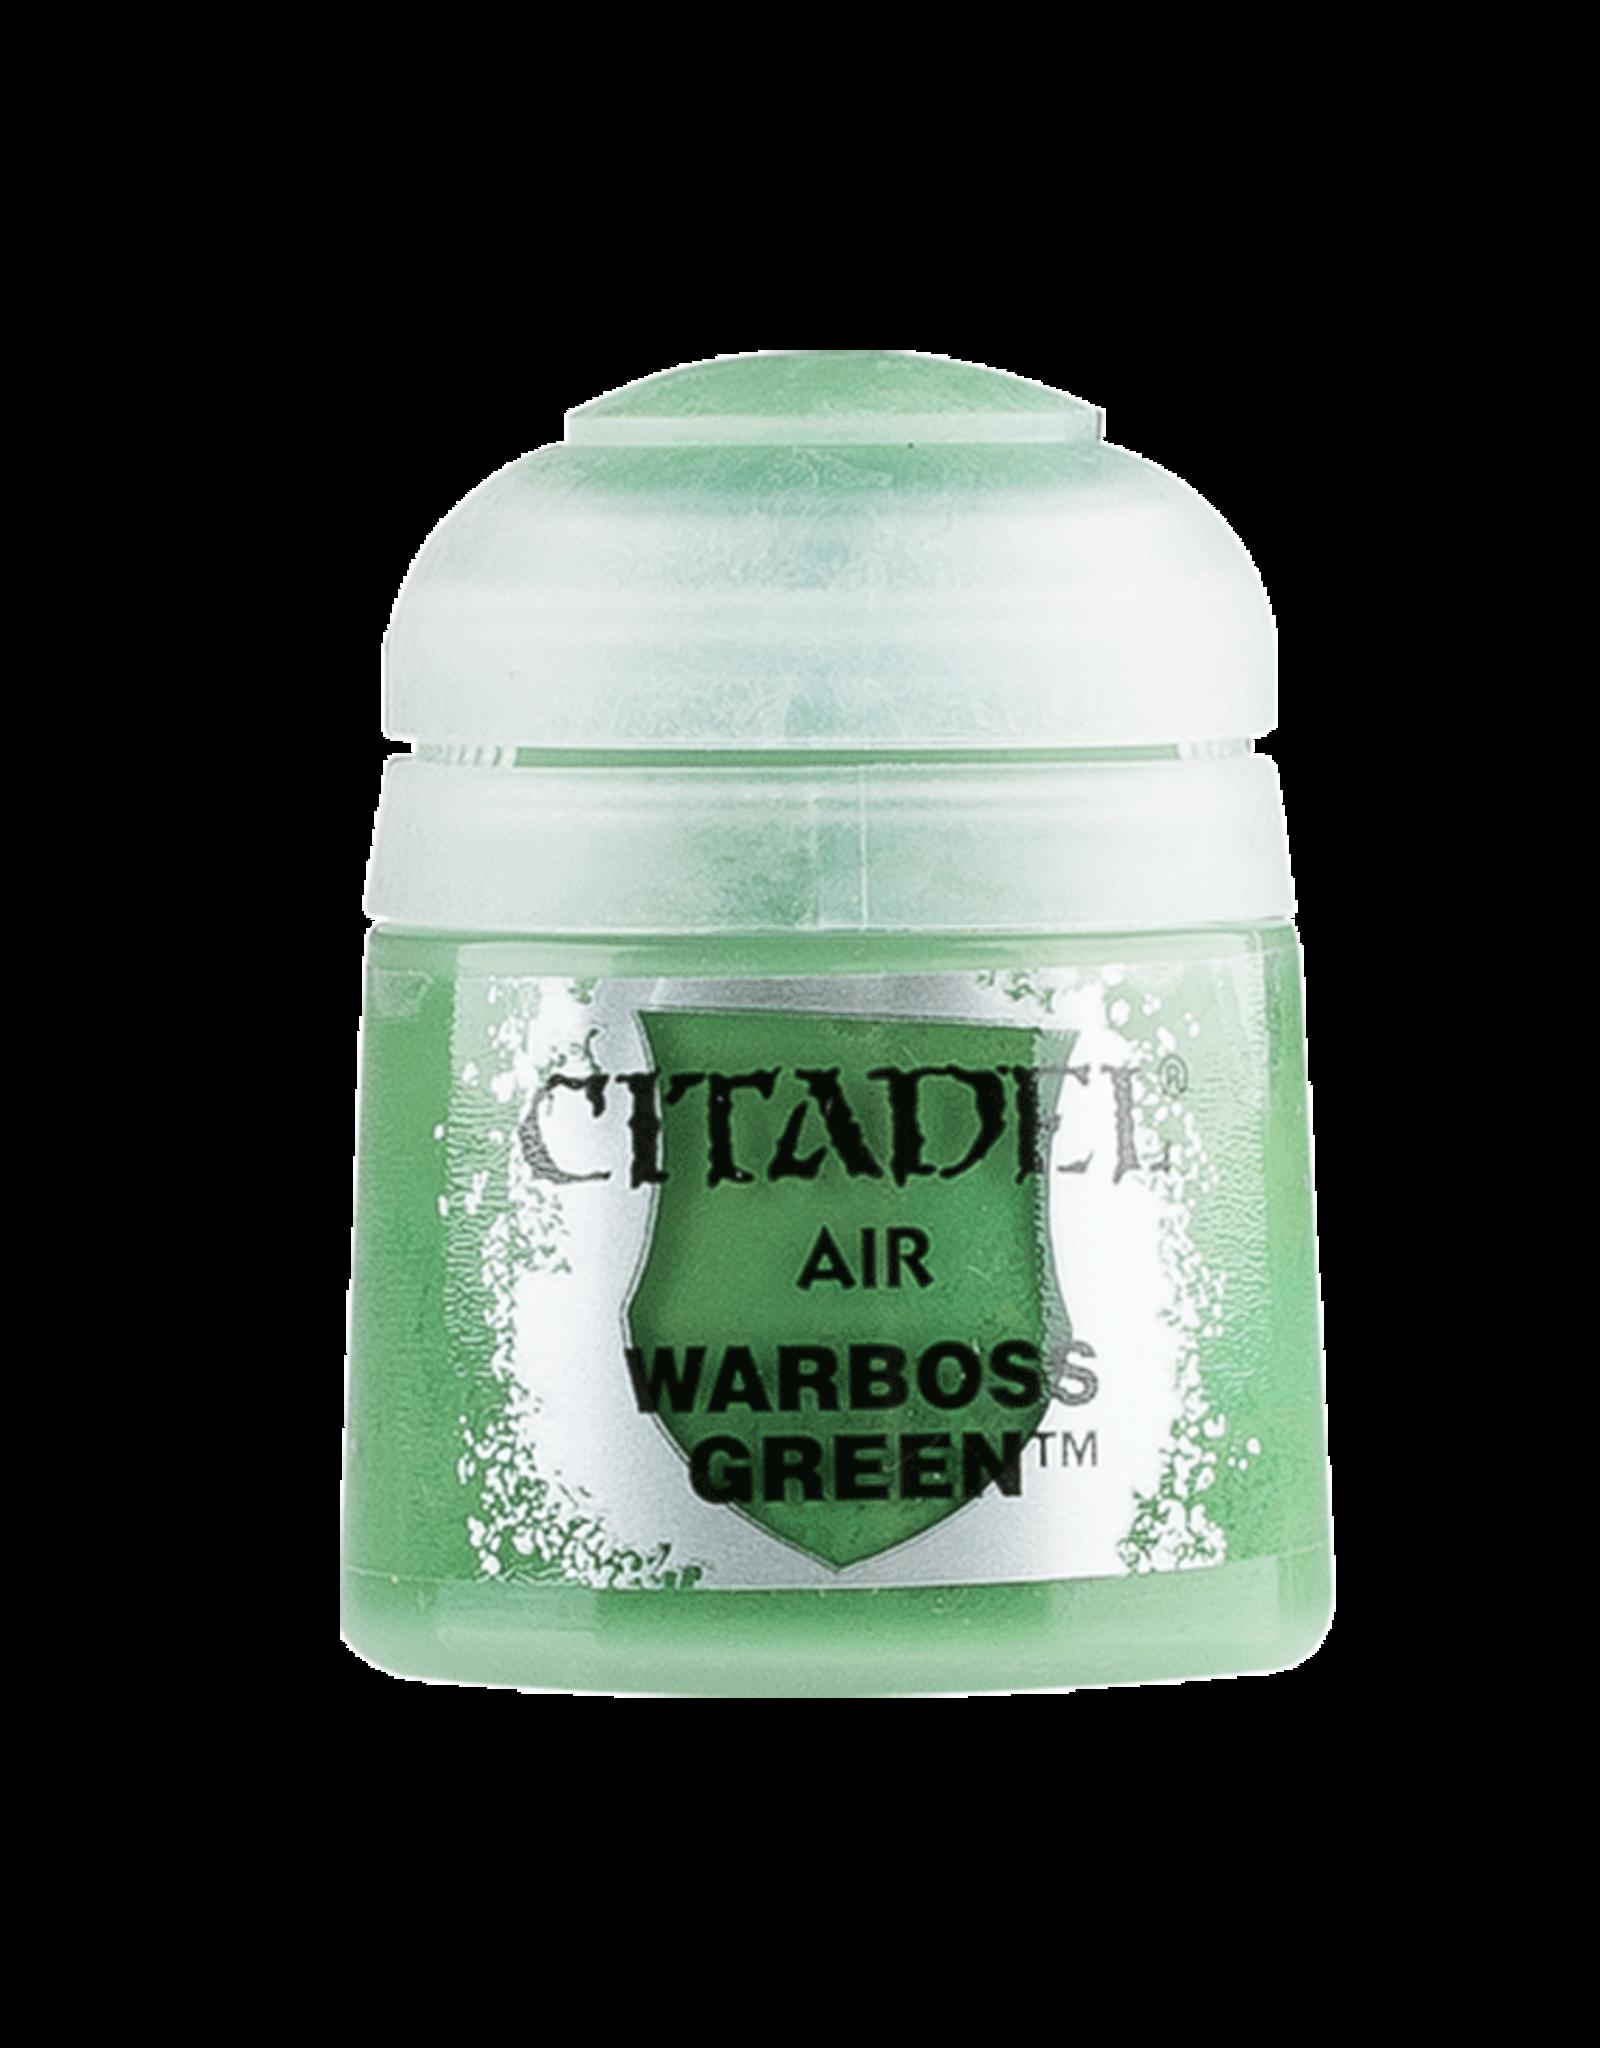 Citadel Citadel Air: Warboss Green (24ml)